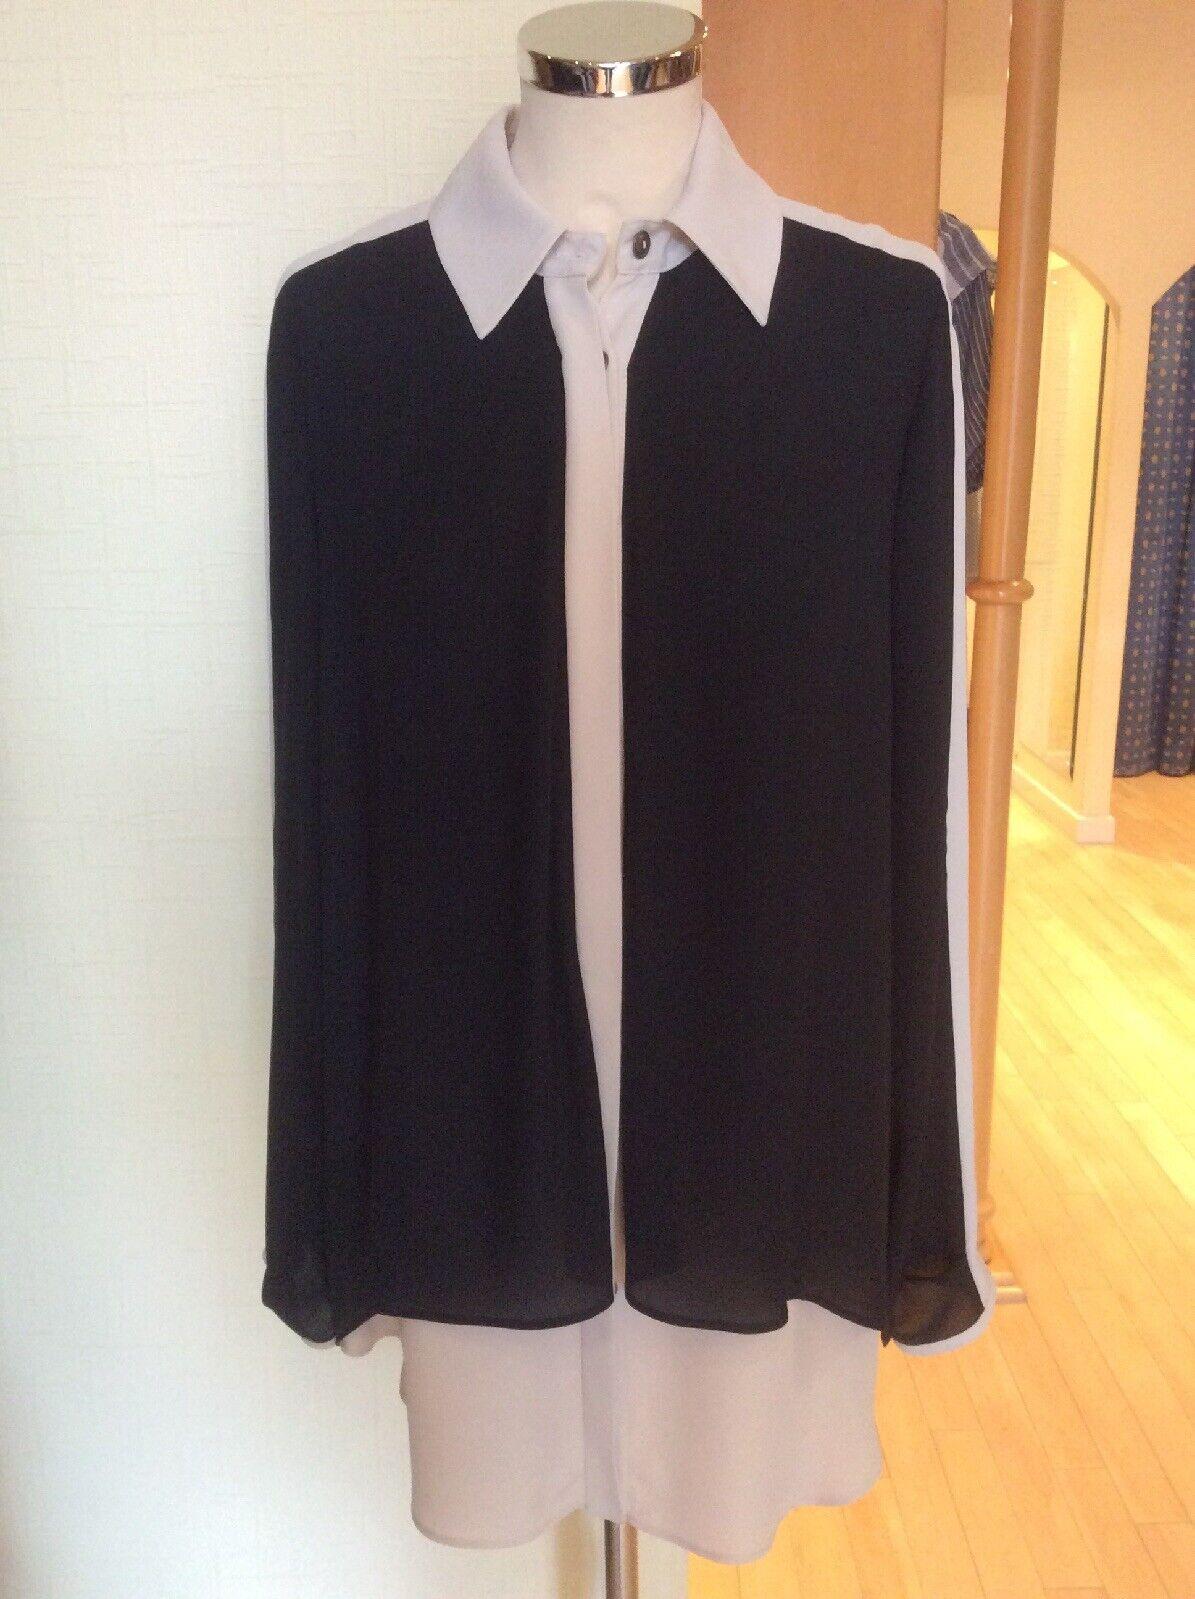 Joseph Ribkoff Blouse Größe 10 BNWT schwarz Beige  Layerot Fabric RRP  Now